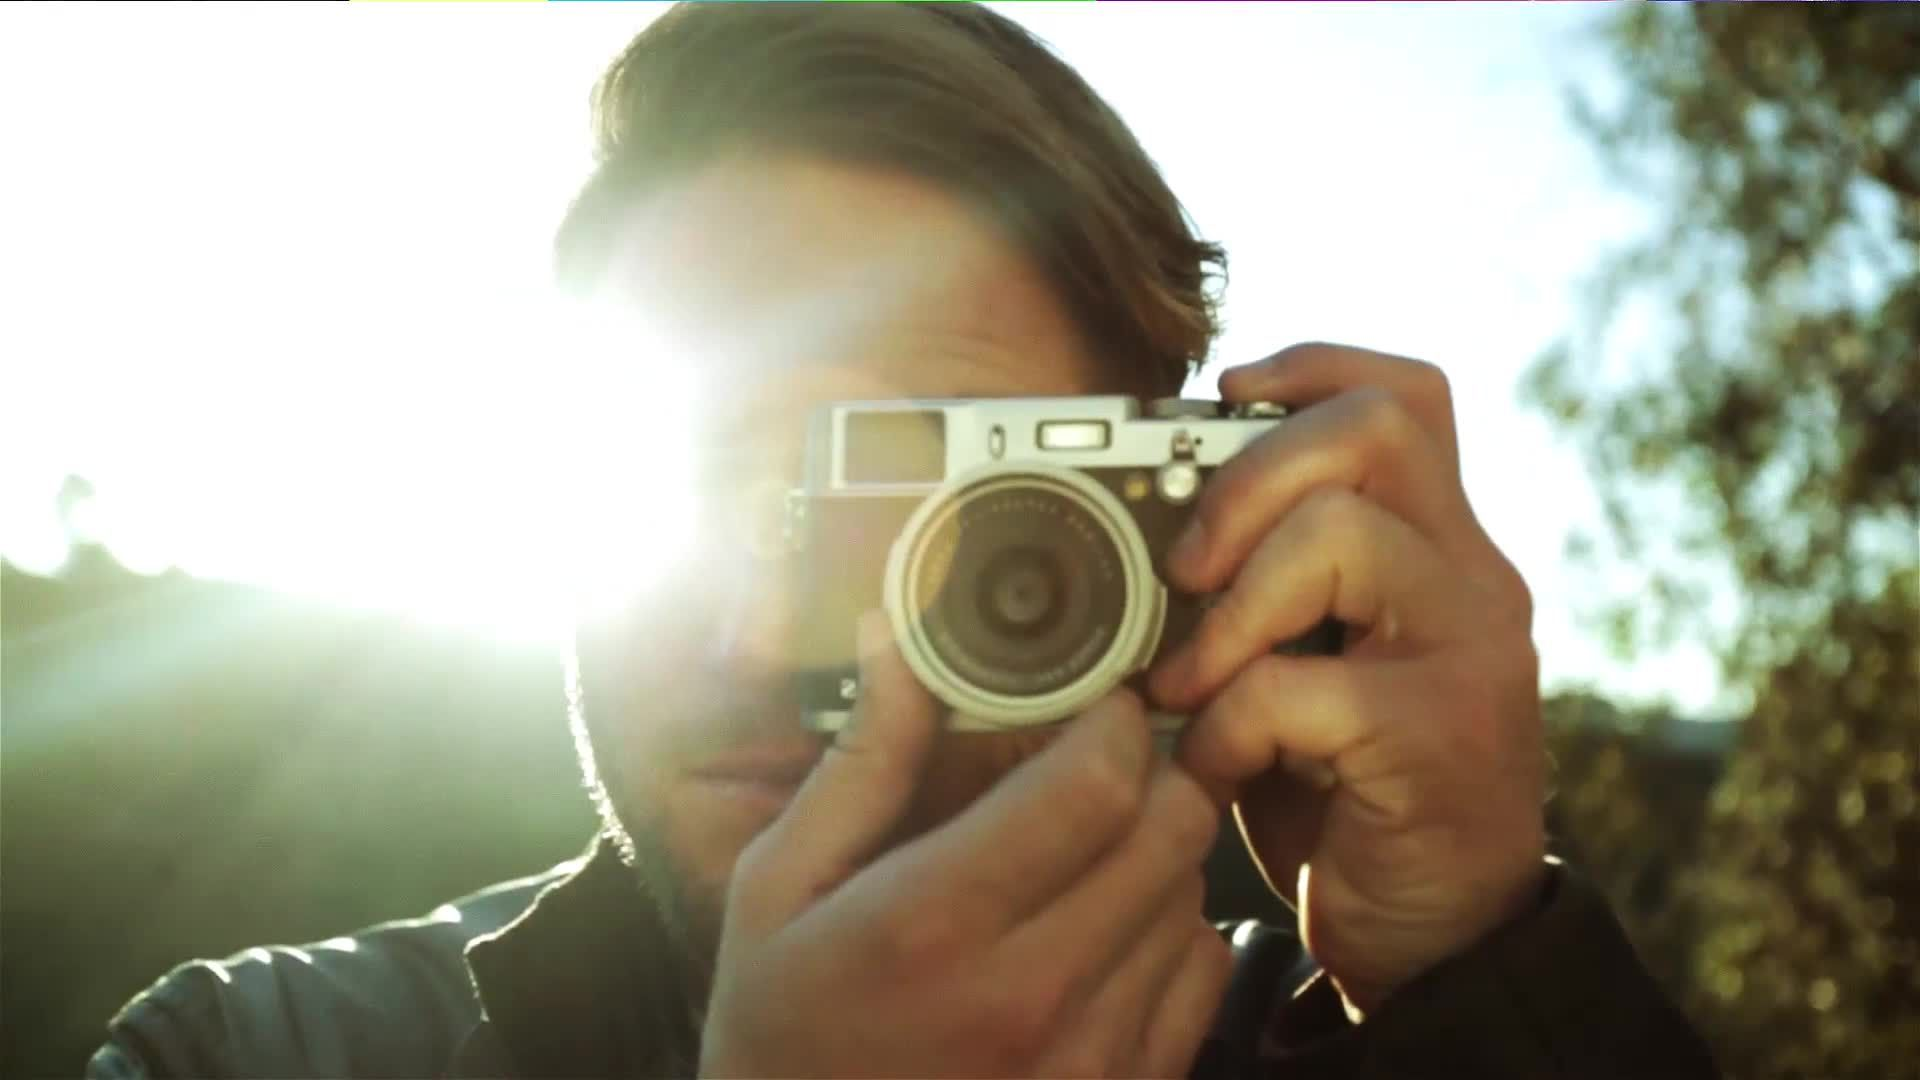 #Trailblazers: Photographer Pete Halvorsen on Capturing the Perfect Moment